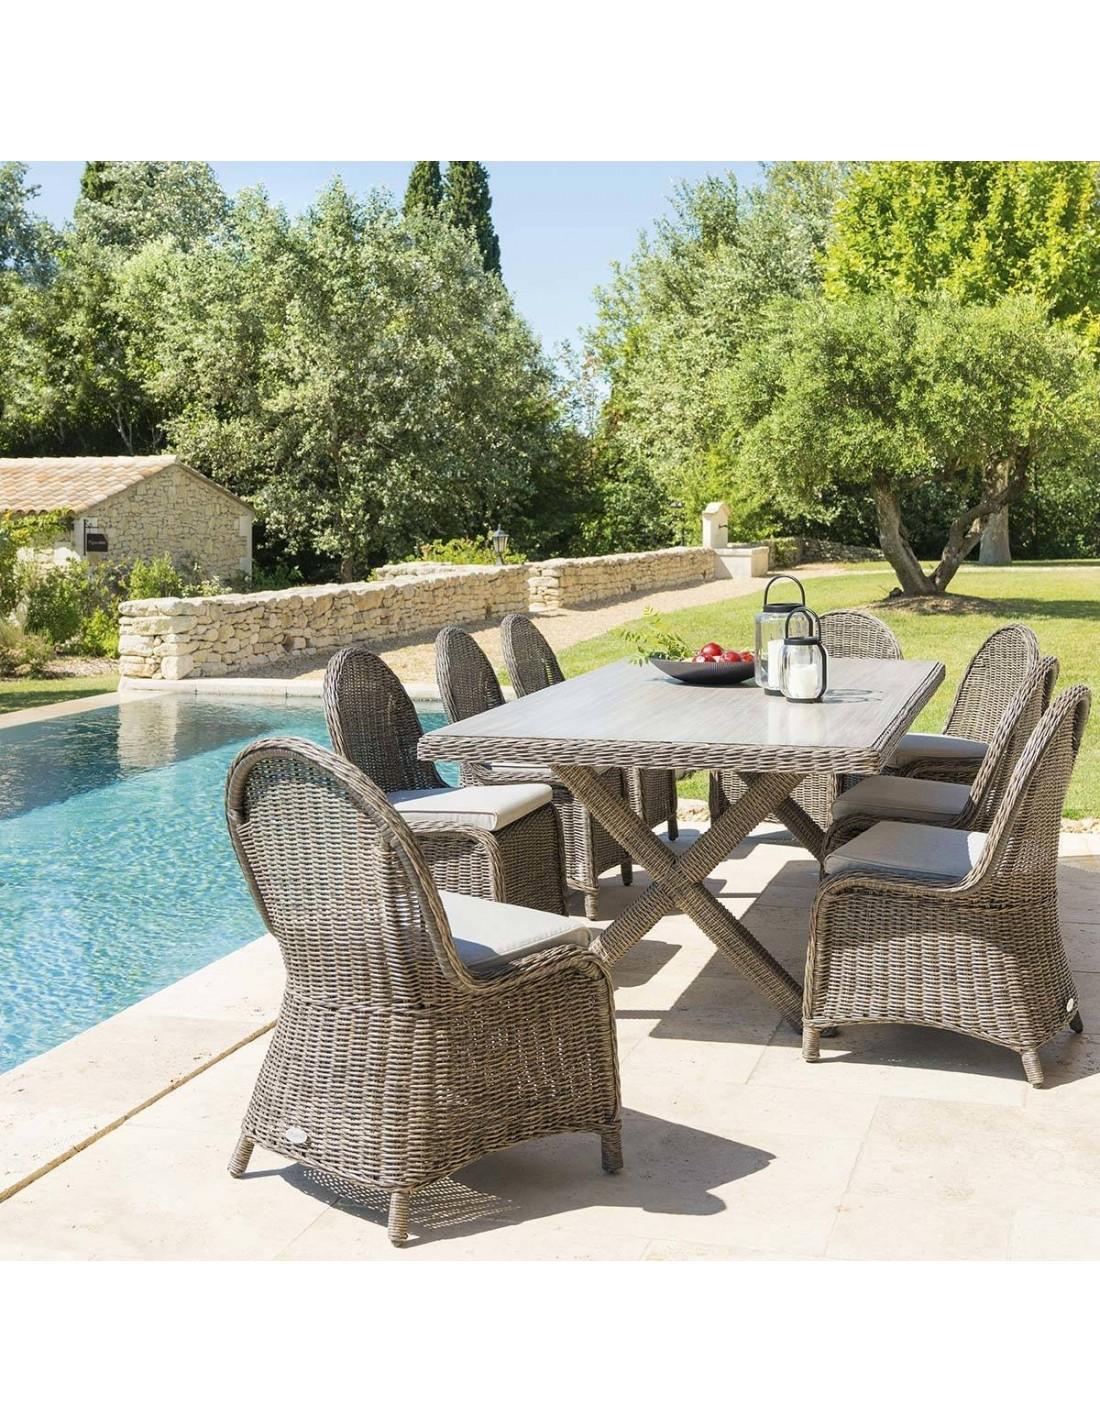 table de jardin betong 8 places r sine tress e hesp ride. Black Bedroom Furniture Sets. Home Design Ideas